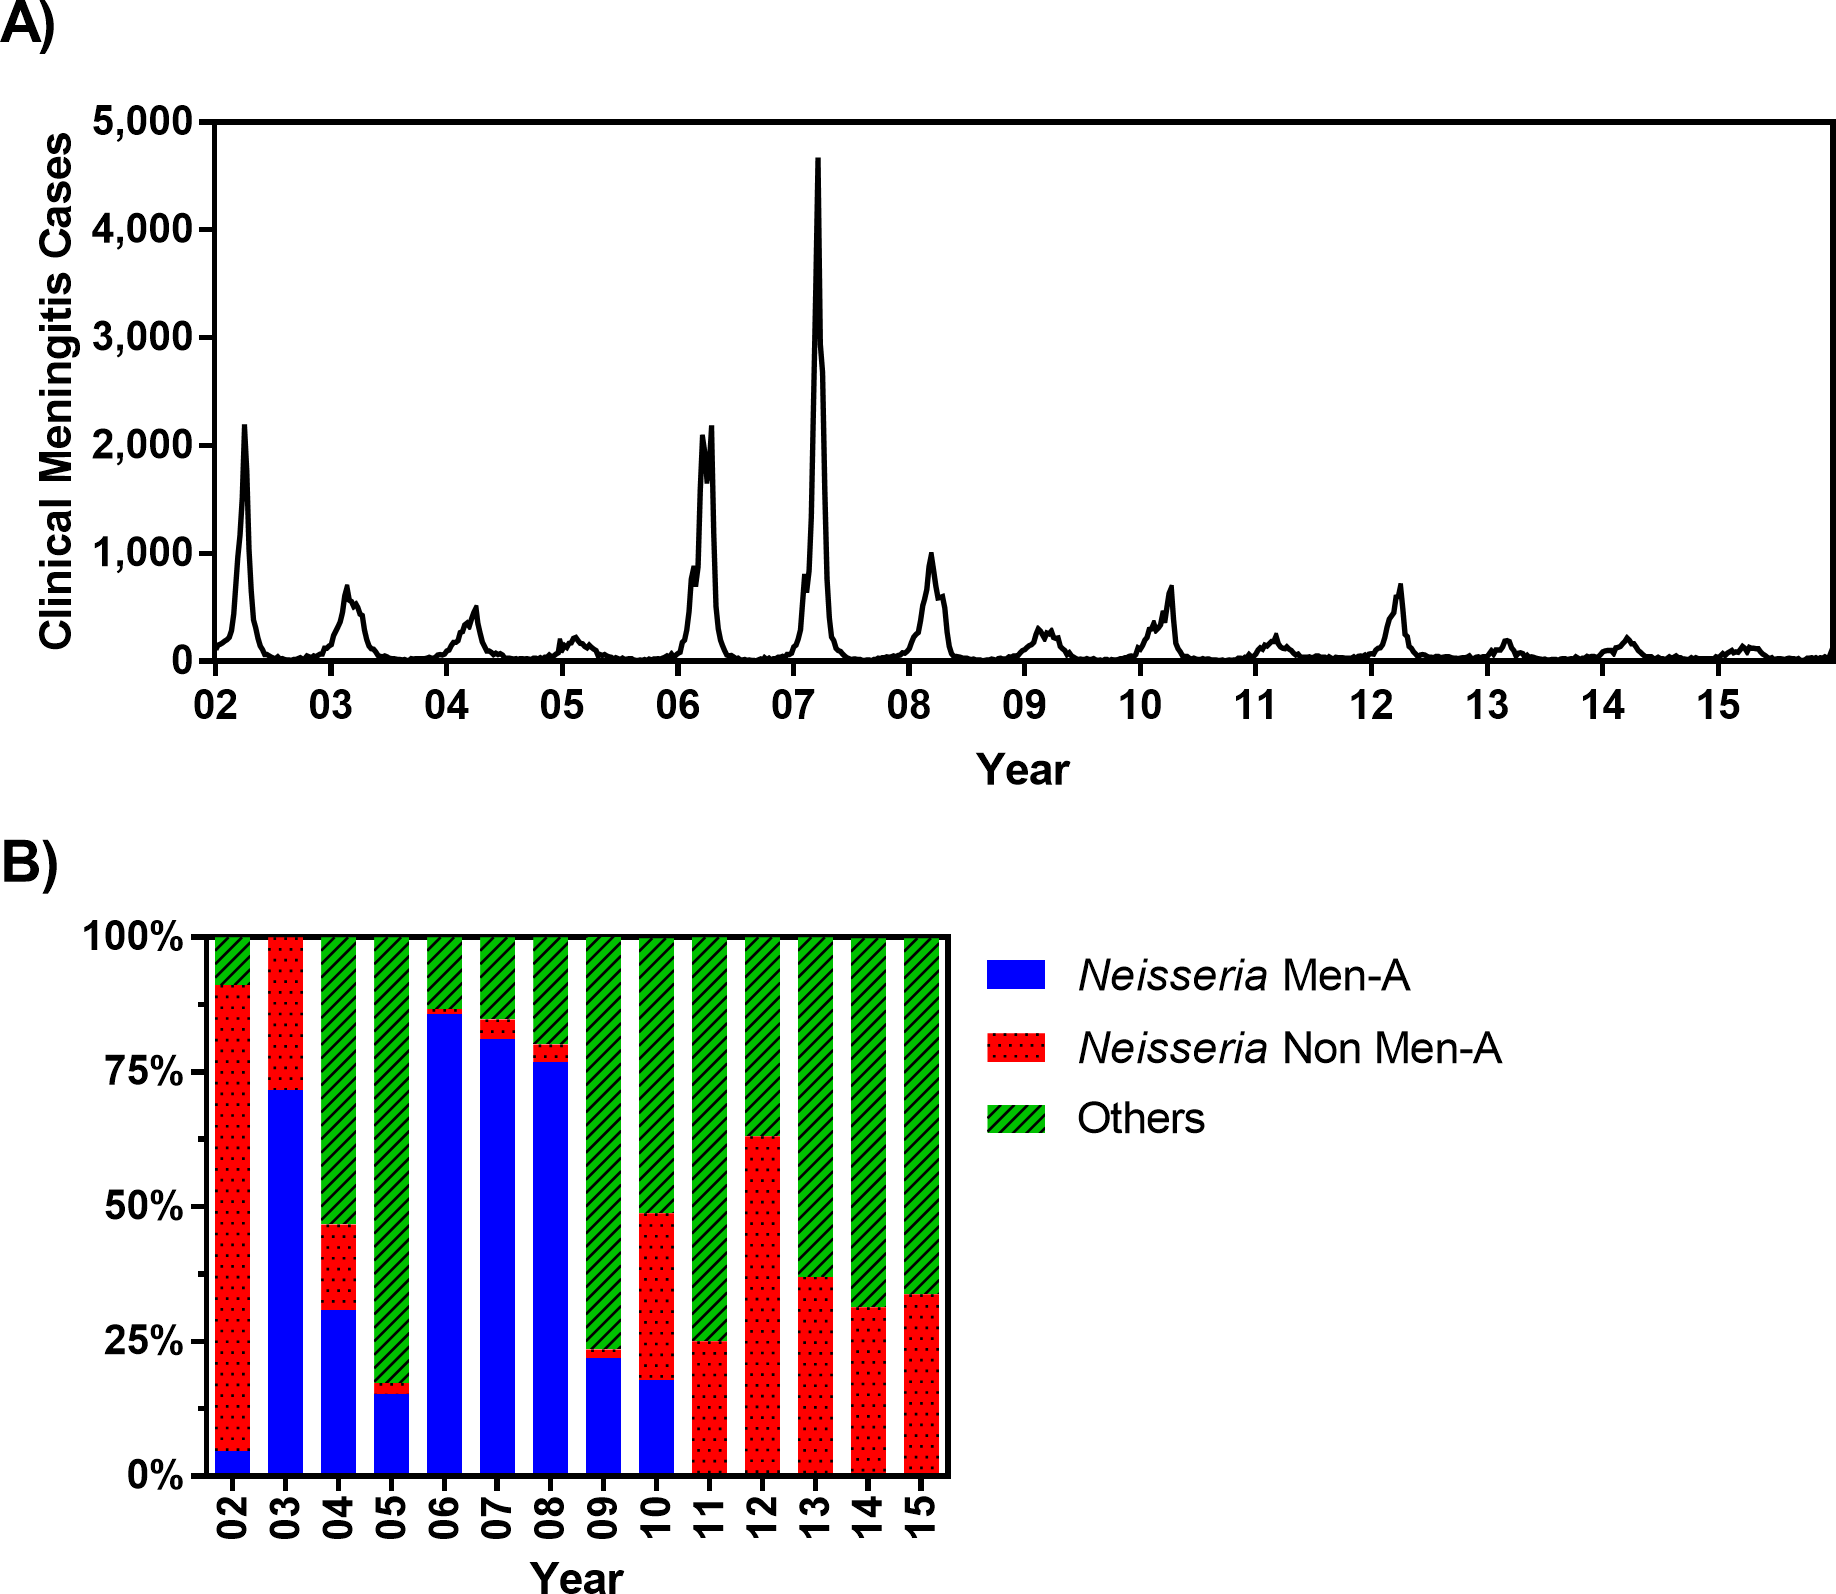 (A) Weekly clinical meningitis cases in Burkina Faso reported between 2002 and 2015 (data were made available from the Ministry of Health, Burkina Faso). (B) Percentage of confirmed meningitis cases that are associated to <i>Neisseria meningitis</i> serogroup A, <i>N</i>. <i>meningitidis</i> non-A serogroups (including C, W, and X), and other pathogens (including <i>Streptococcus pneumoniae</i> and <i>Haemophilus influenzae</i> type b) from 2002–2015.